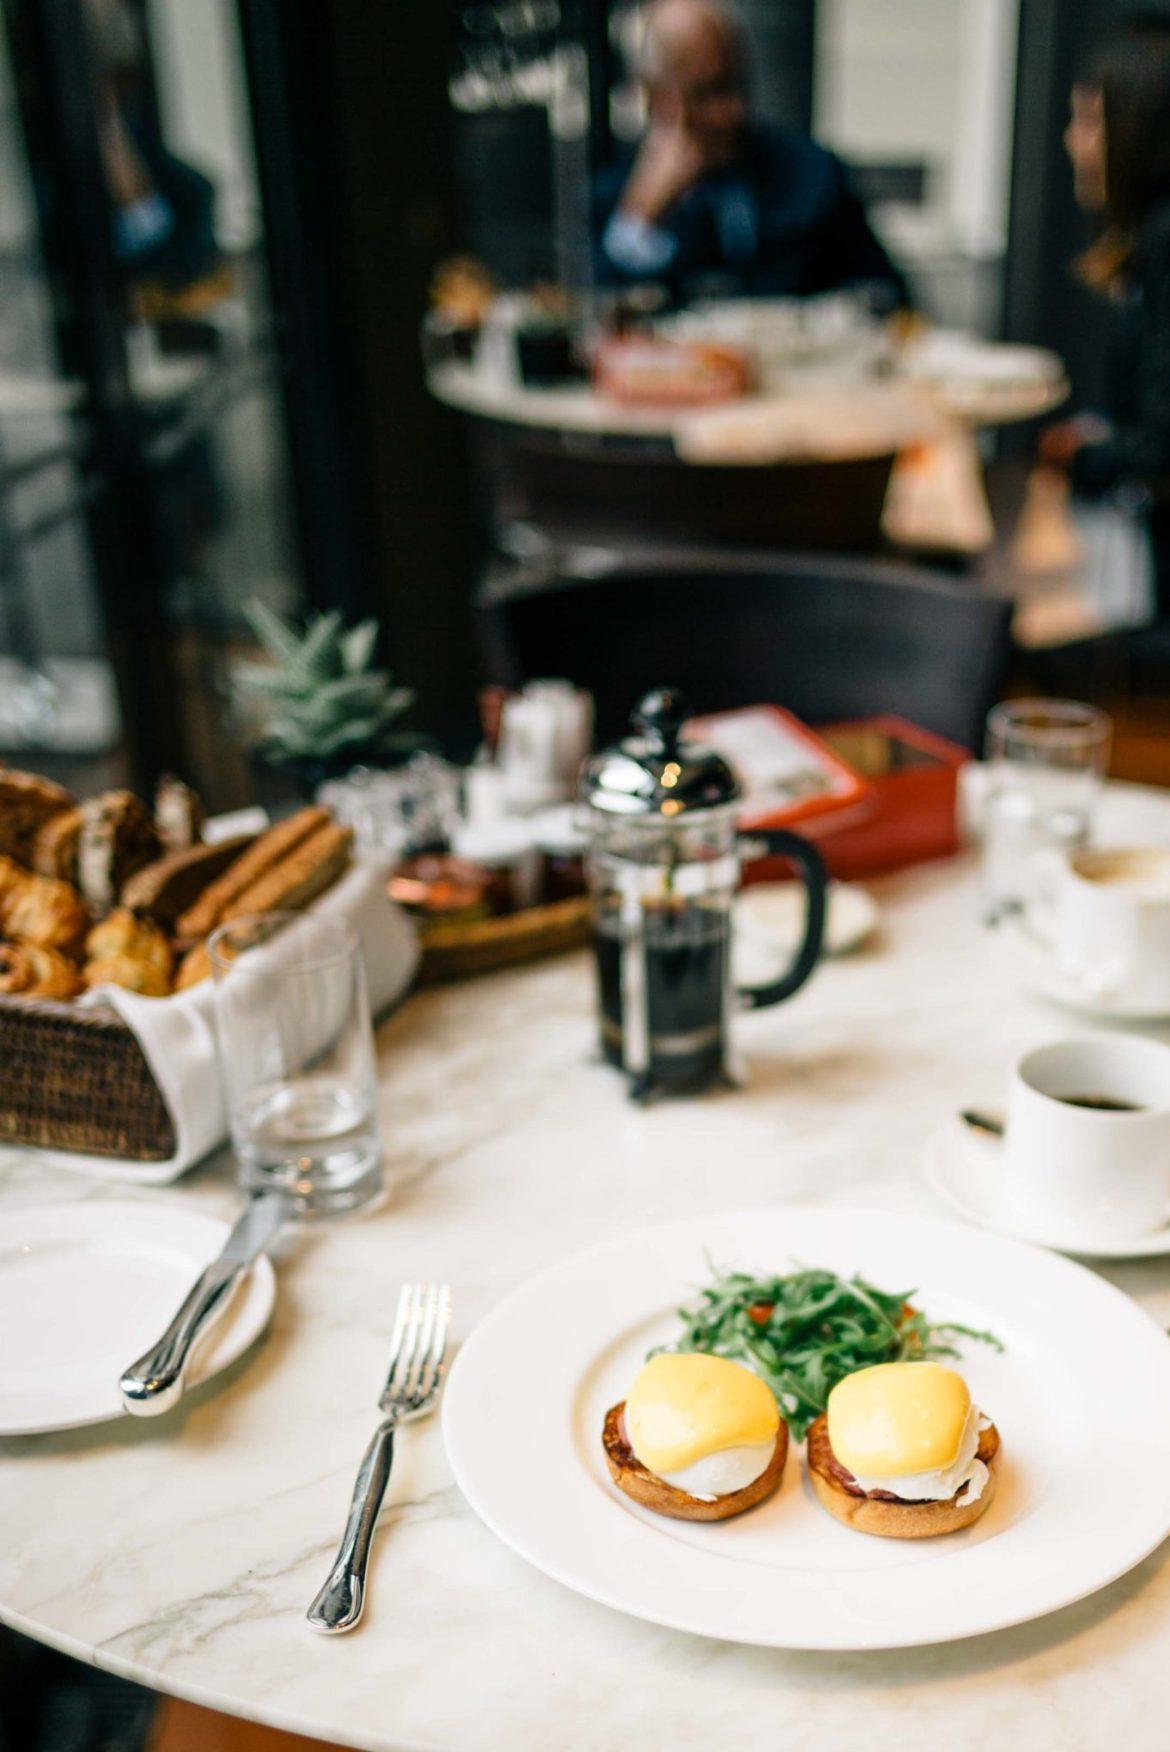 For a full Breakfast in Milan, visit Hotel Bulgari Milano, The Taste Edit